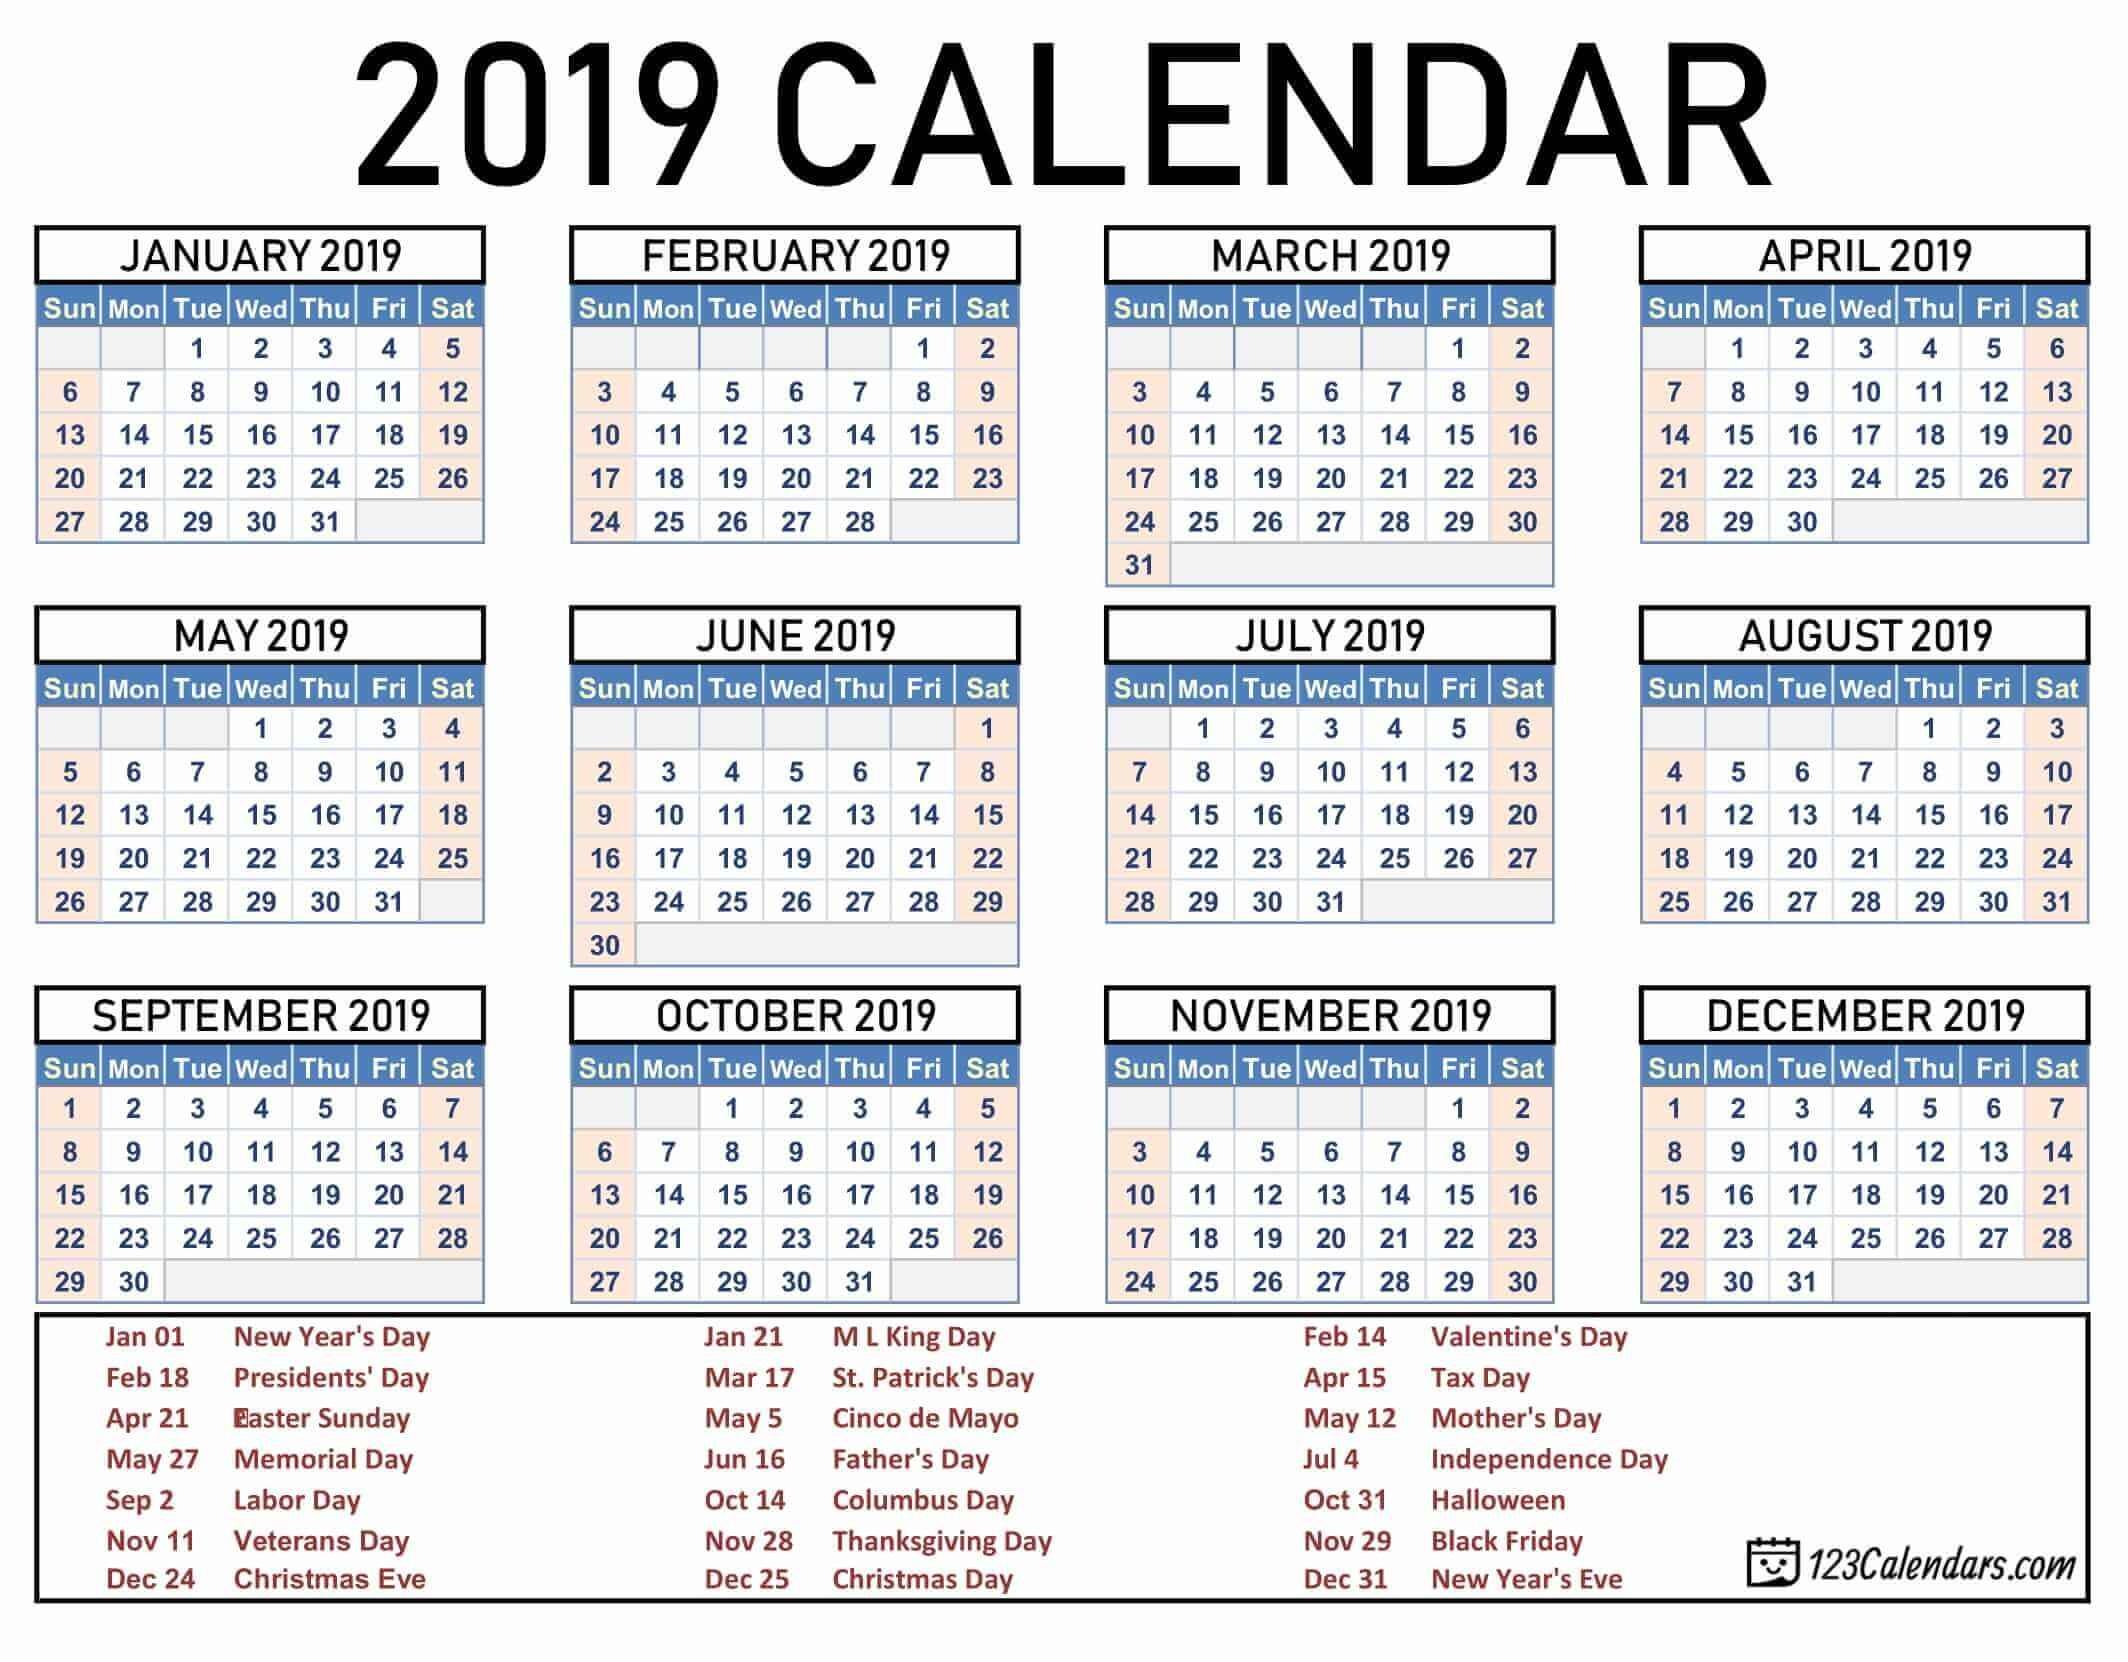 2019 Printable Calendar 123Calendars